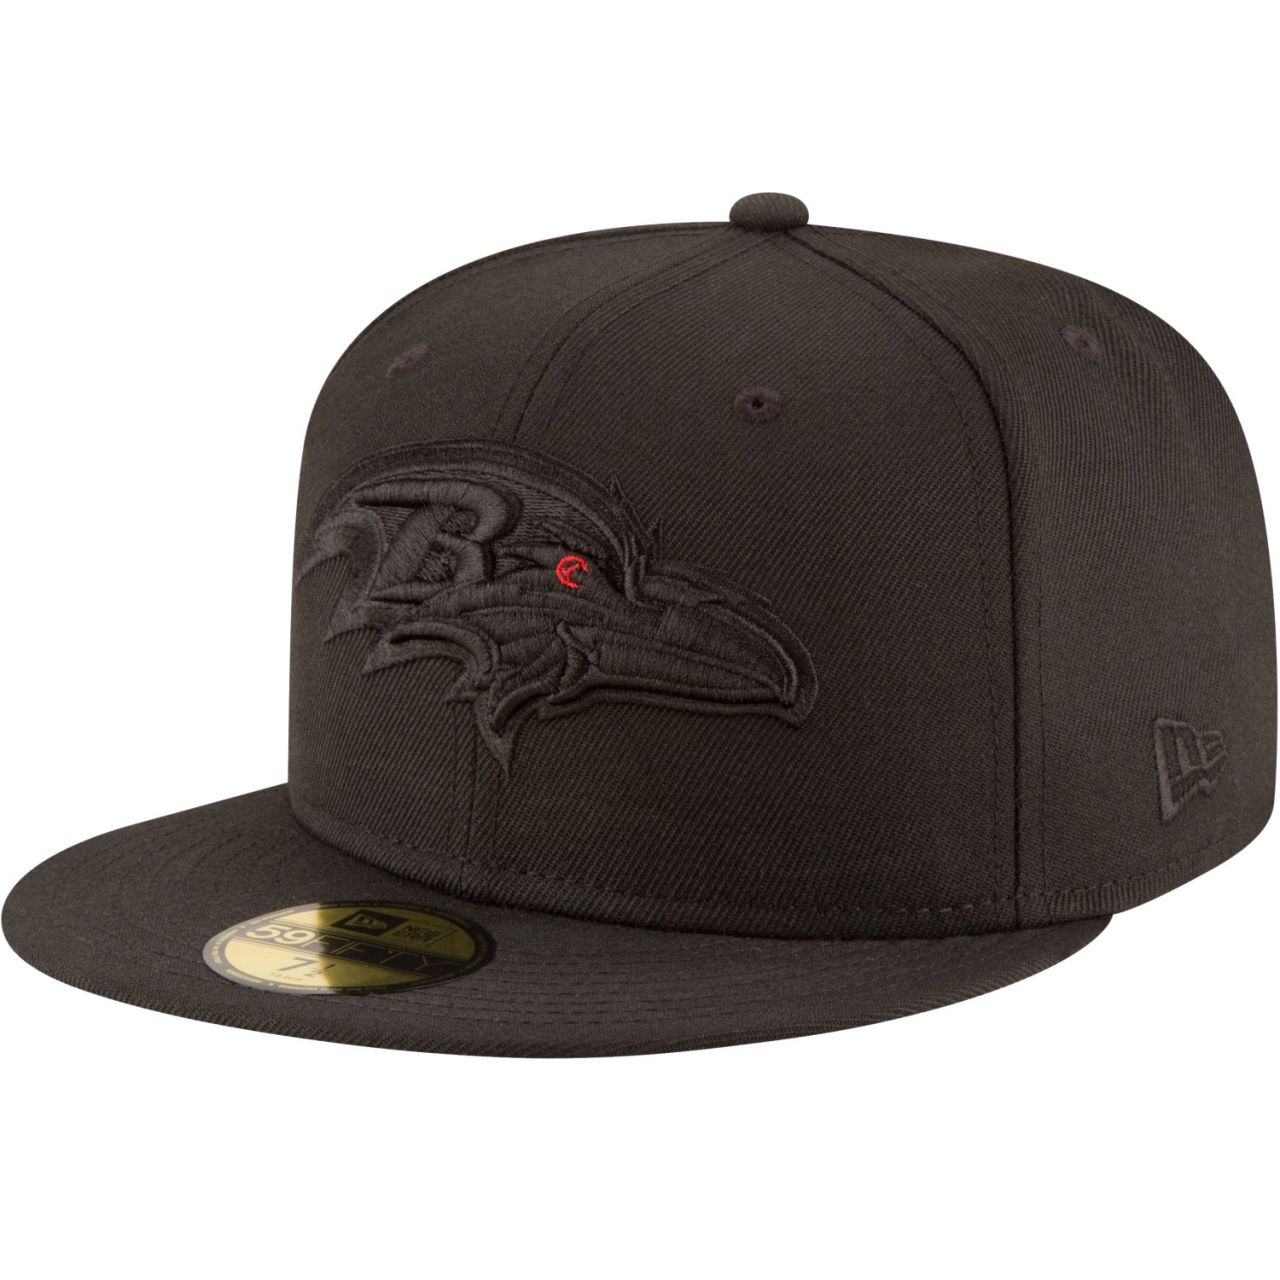 amfoo - New Era 59Fifty Cap - NFL BLACK Baltimore Ravens